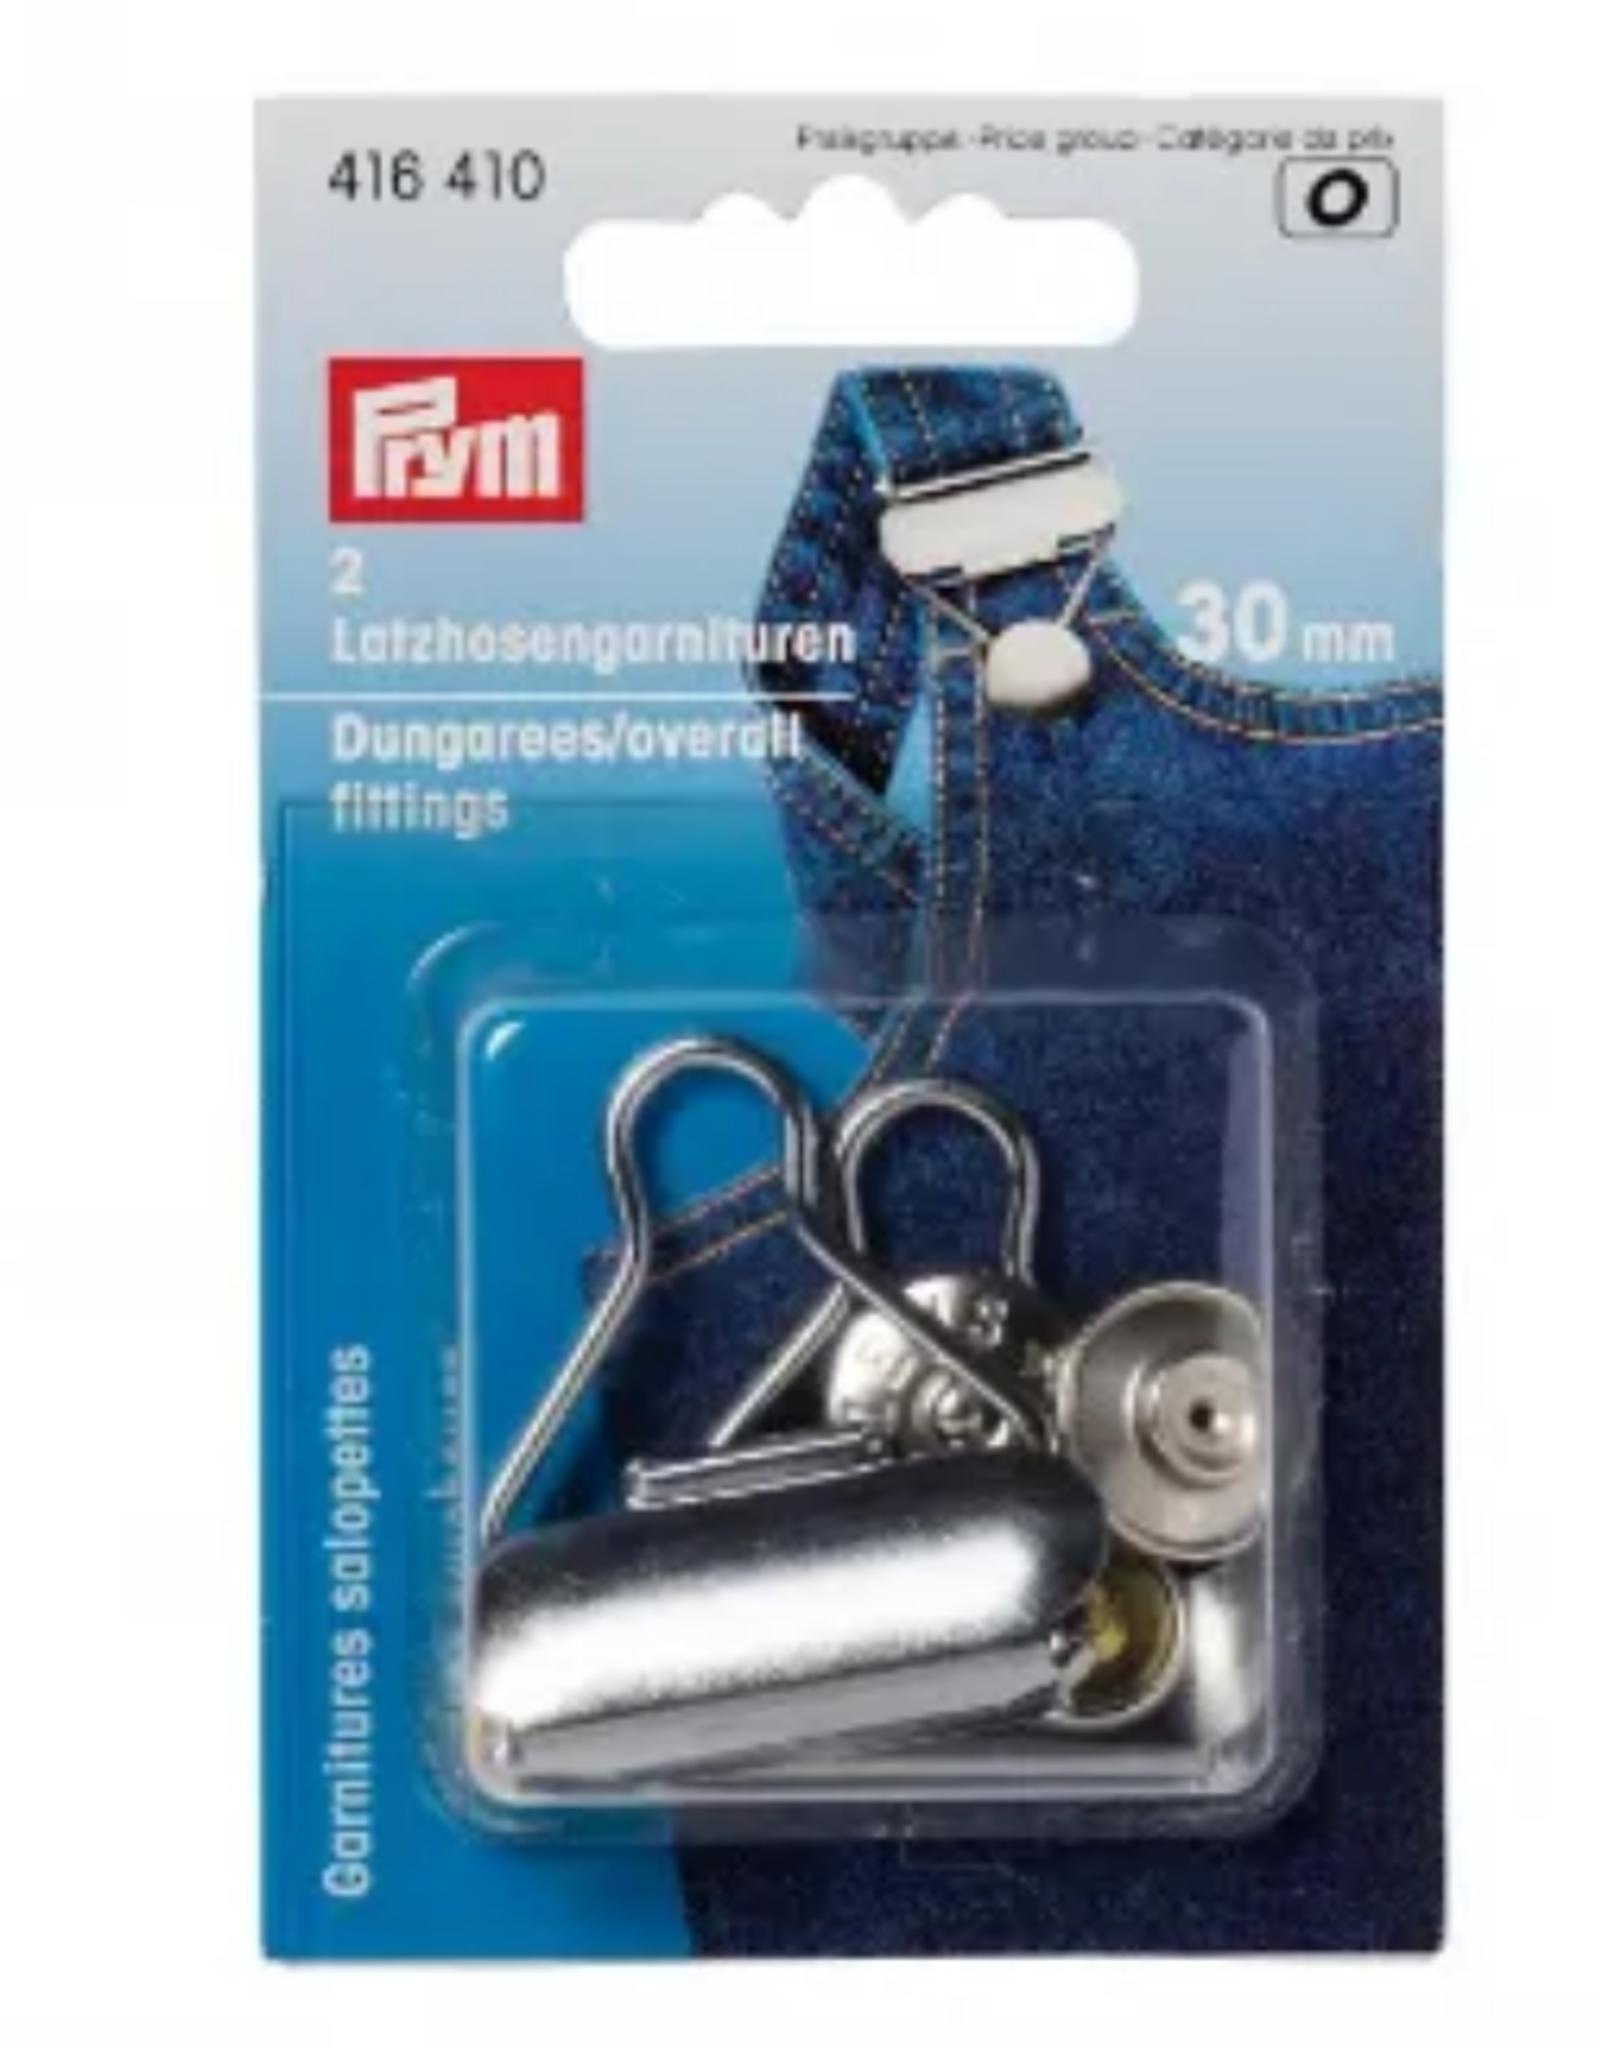 Prym Prym 416.410 - Gespen voor Tuinbroek 30mm